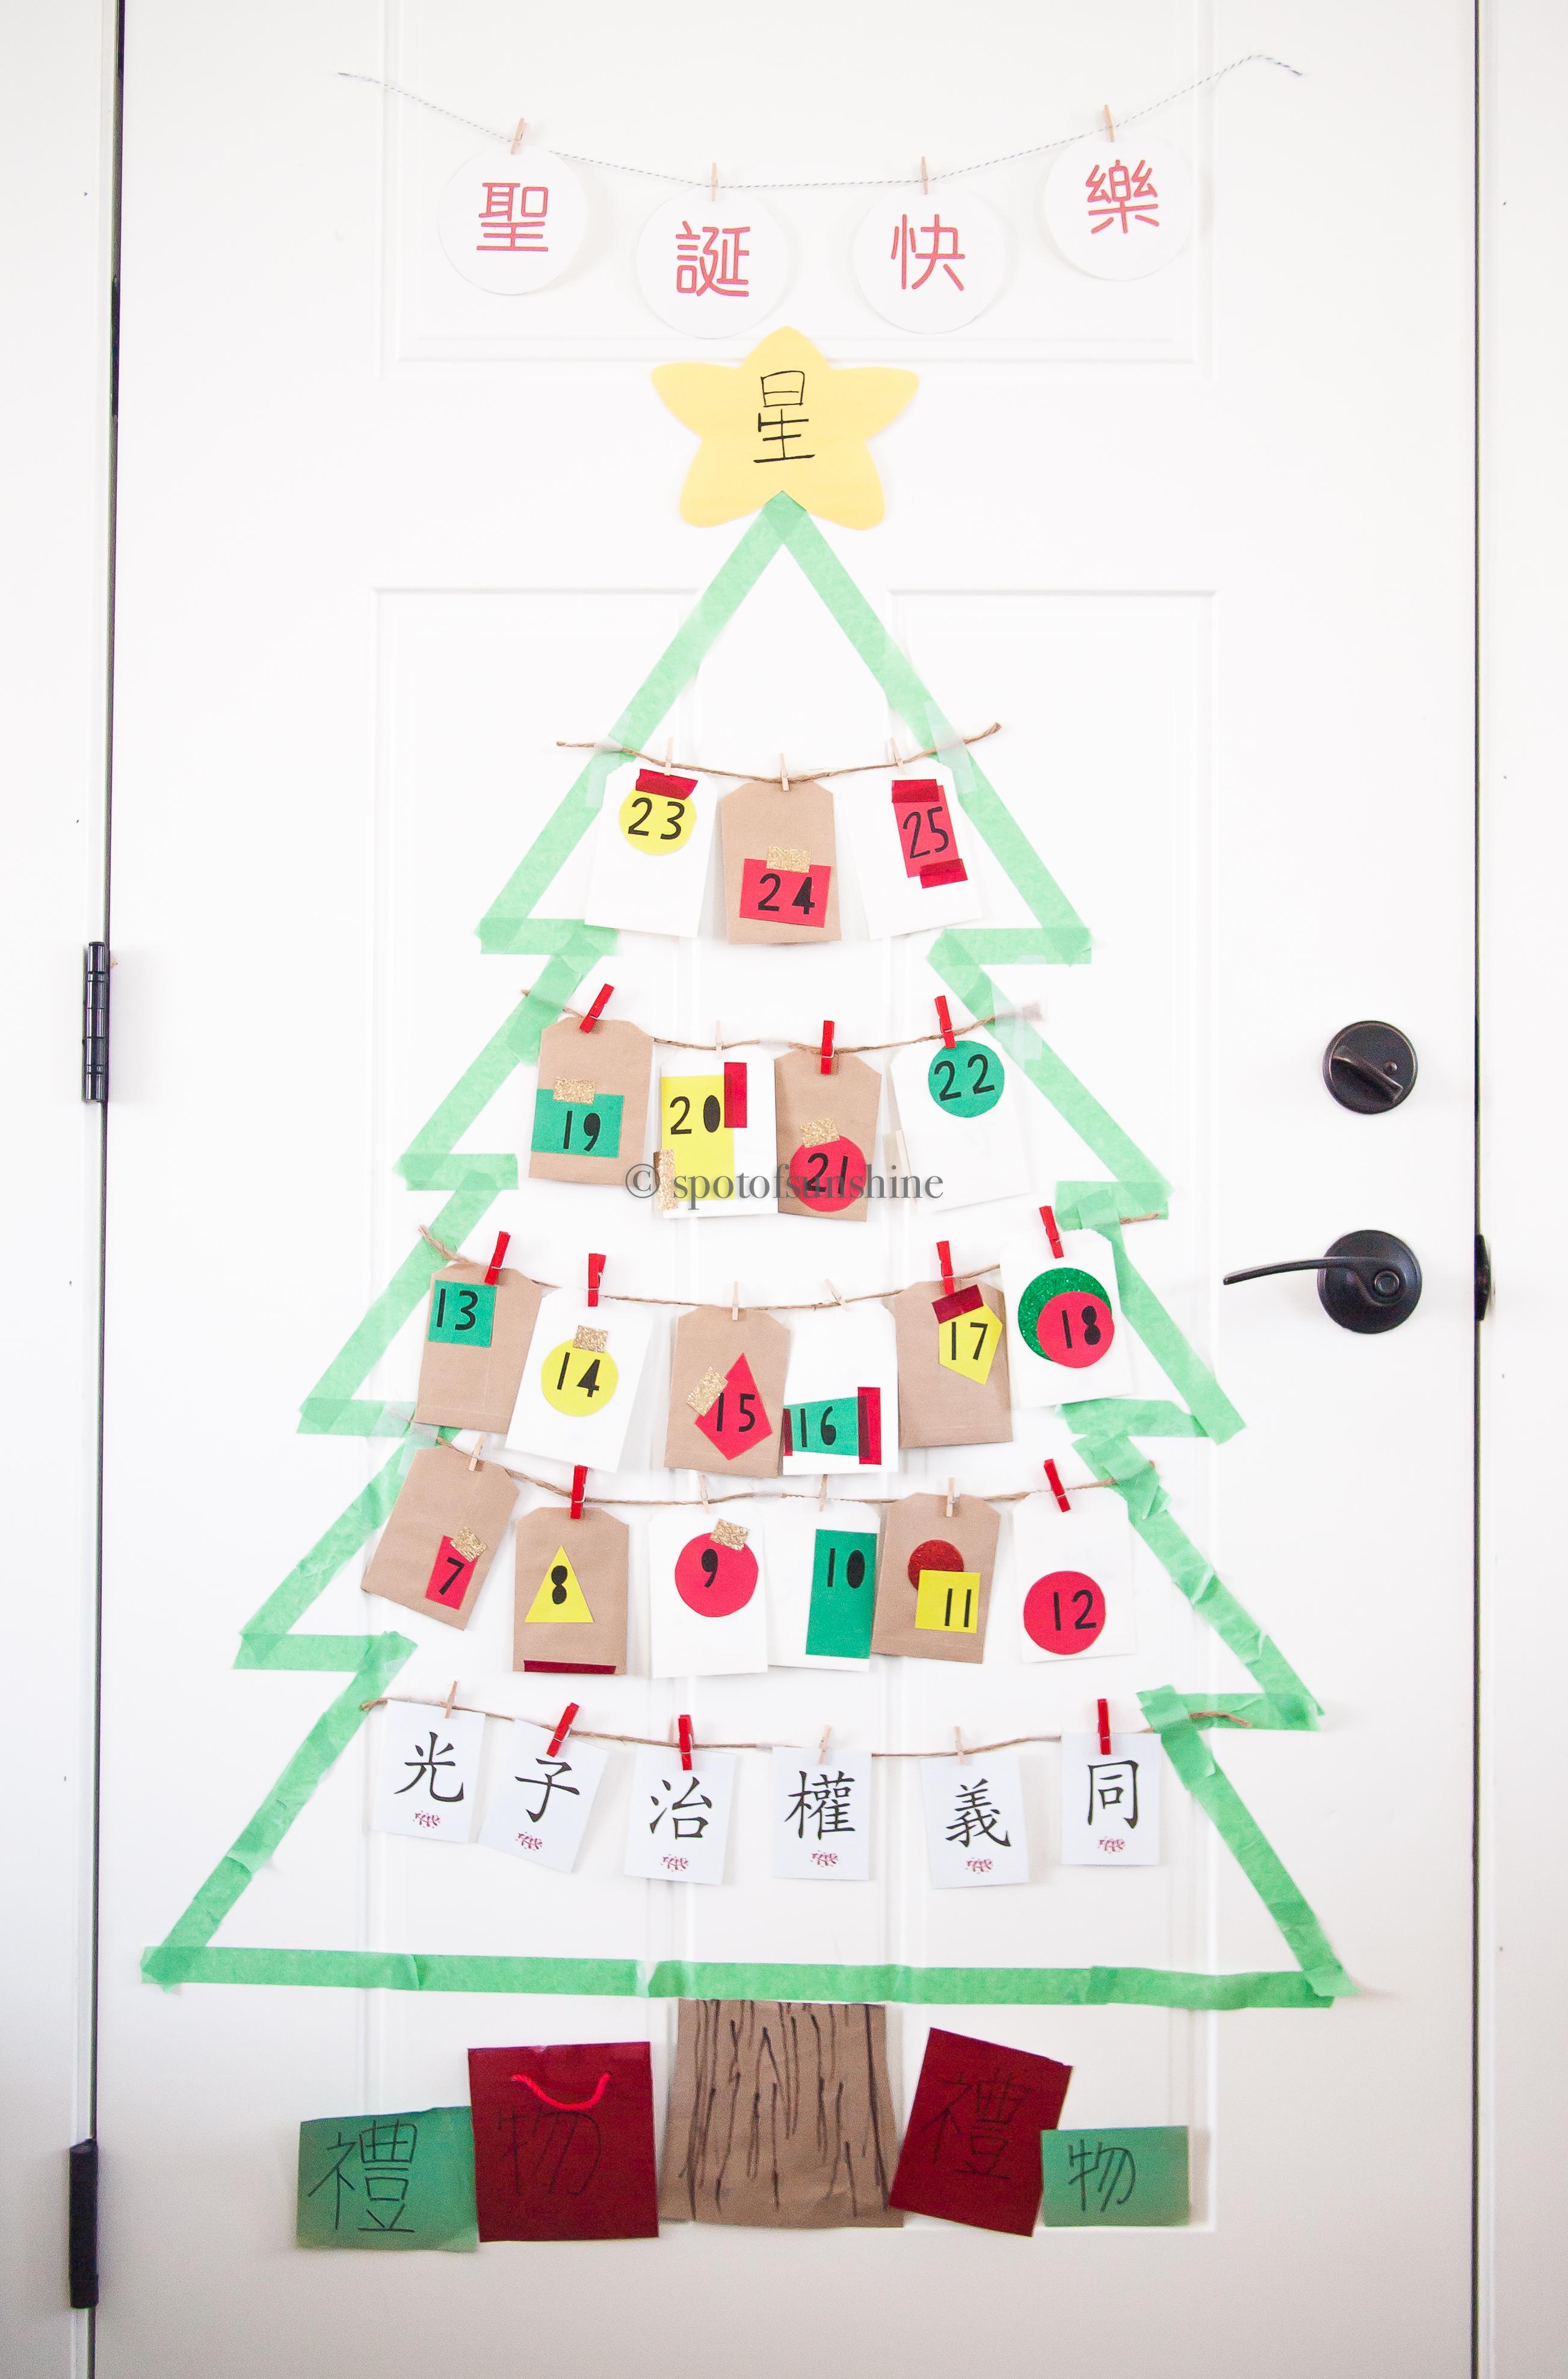 Chinese Advent reading plan Christmas 聖誕降臨 降臨節倒數